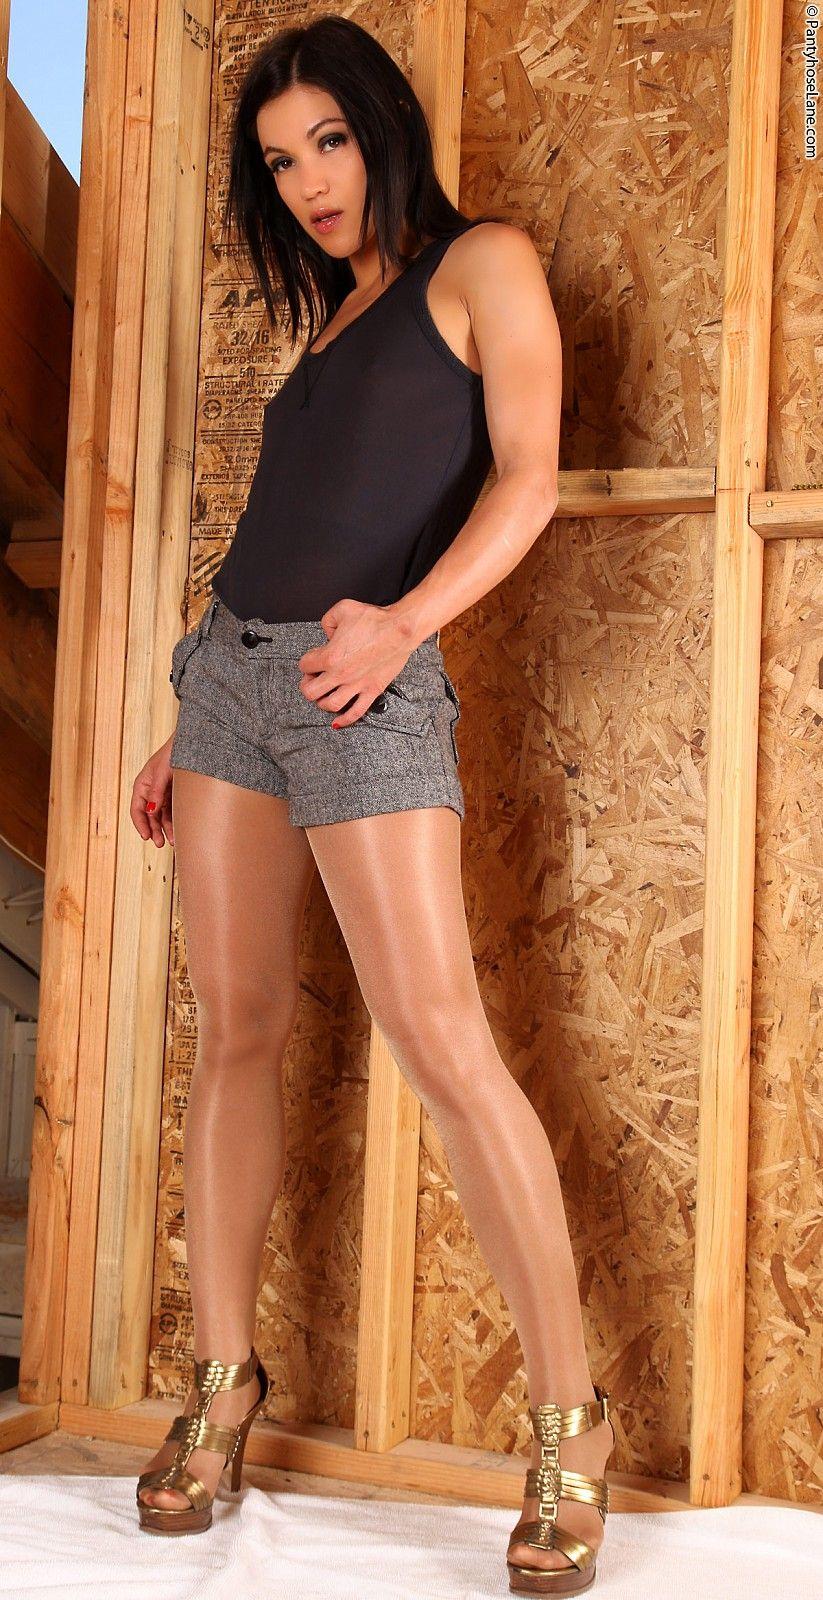 Alyssa Reece Nude Pics pin on hot heels and hose